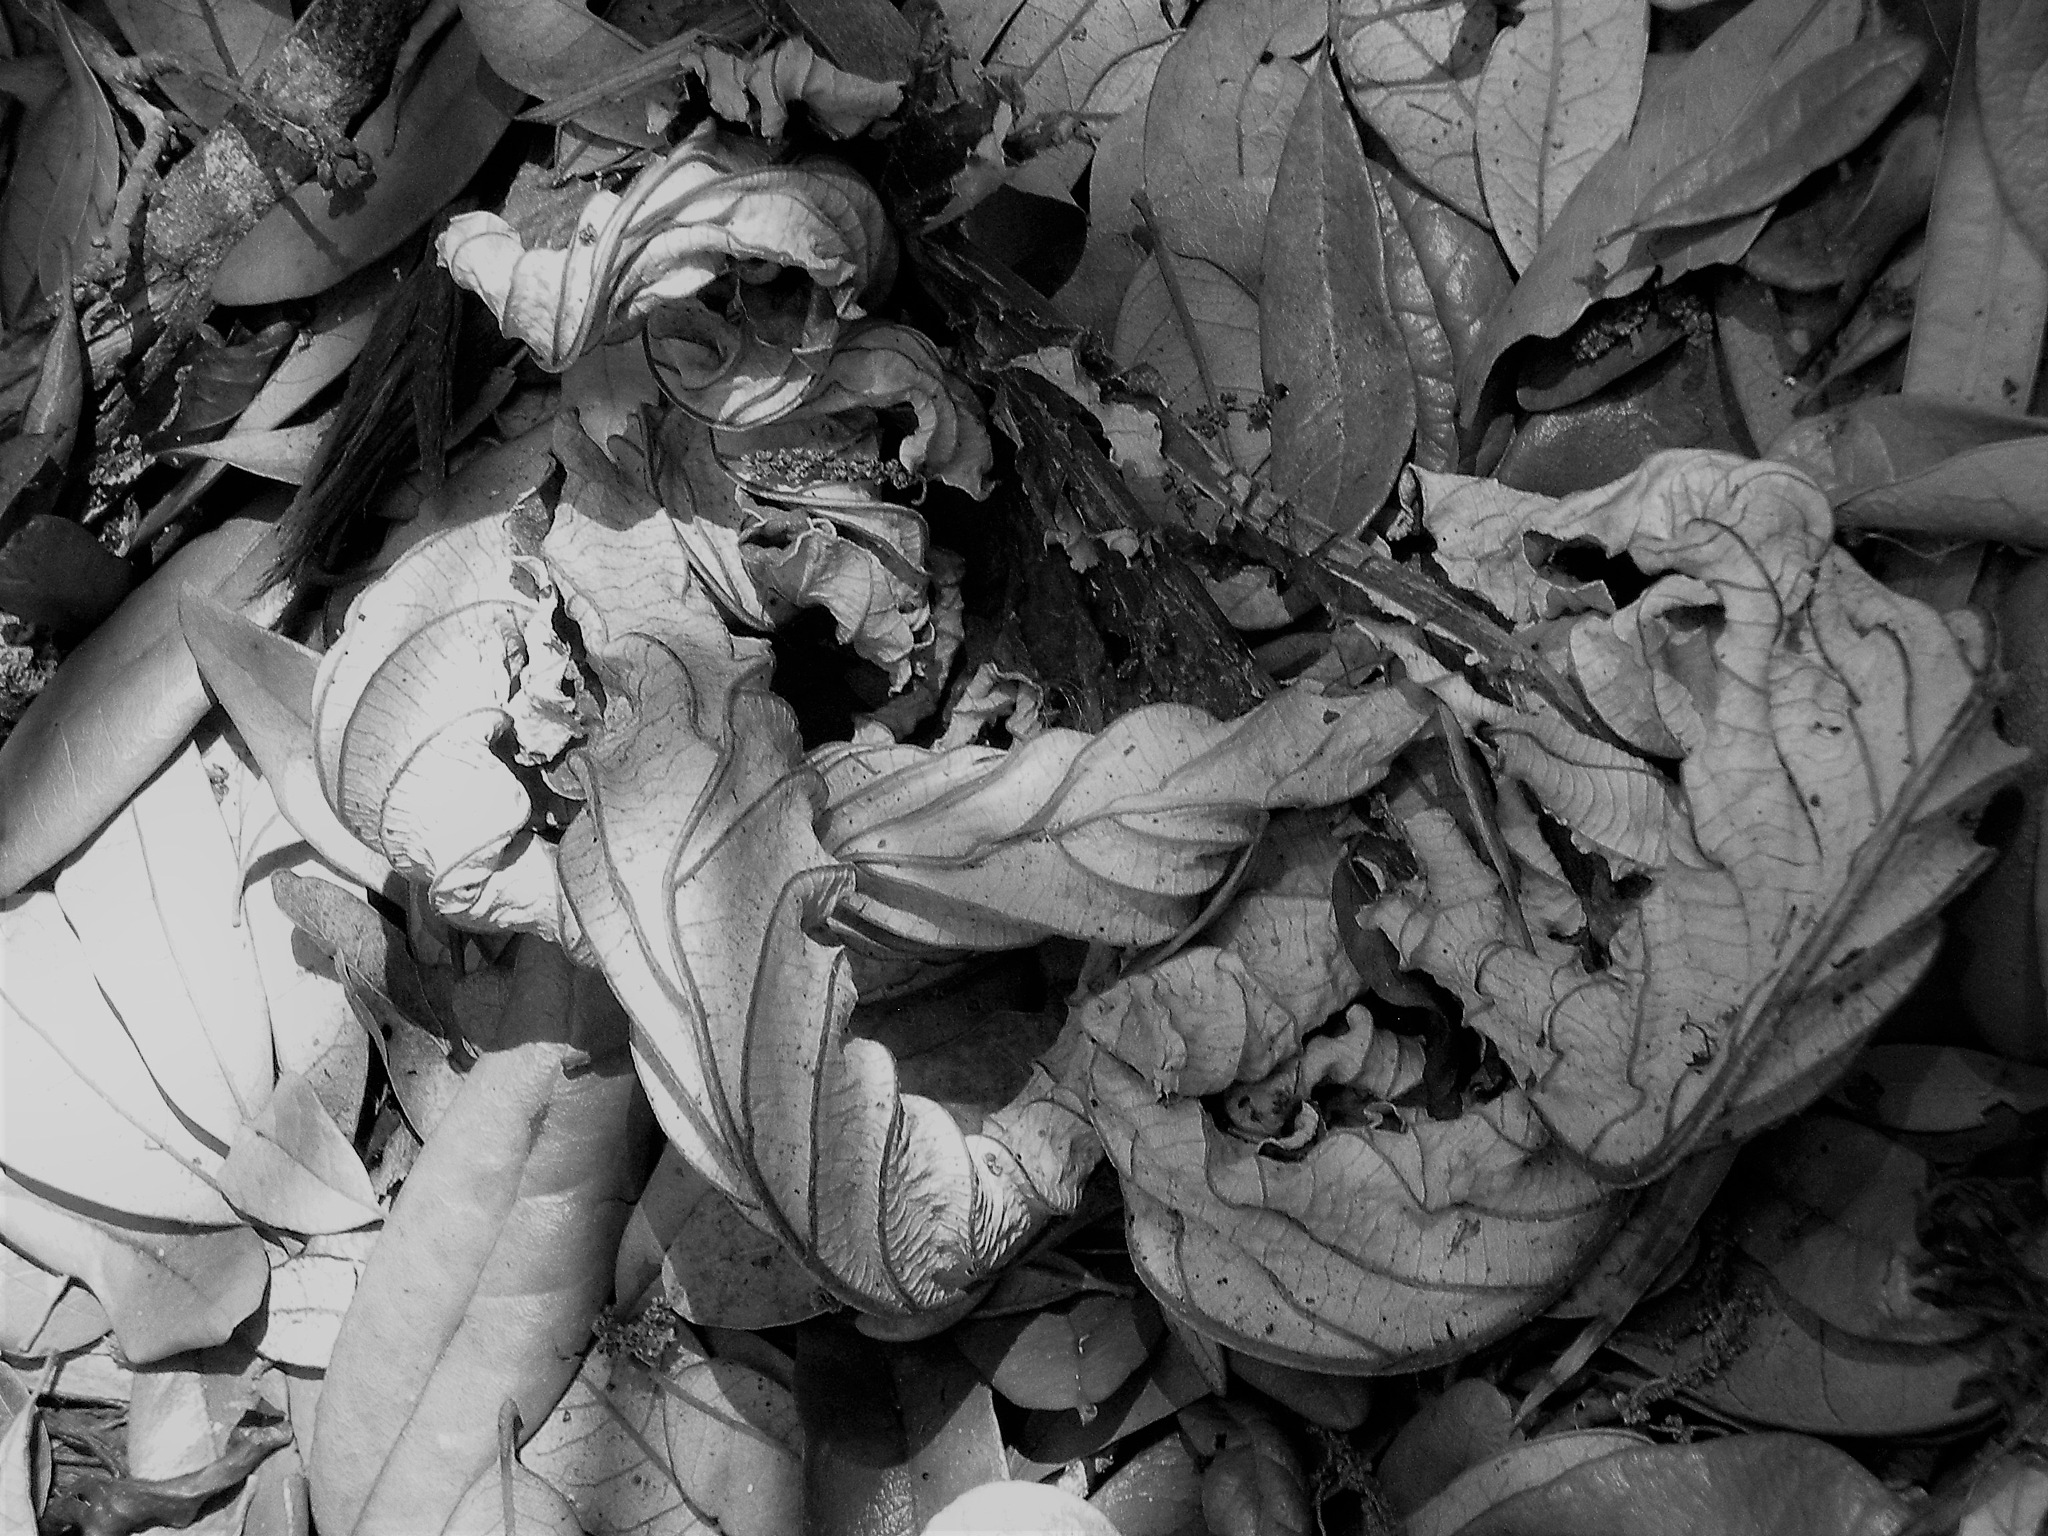 Fall leaves by Barbara Stockford